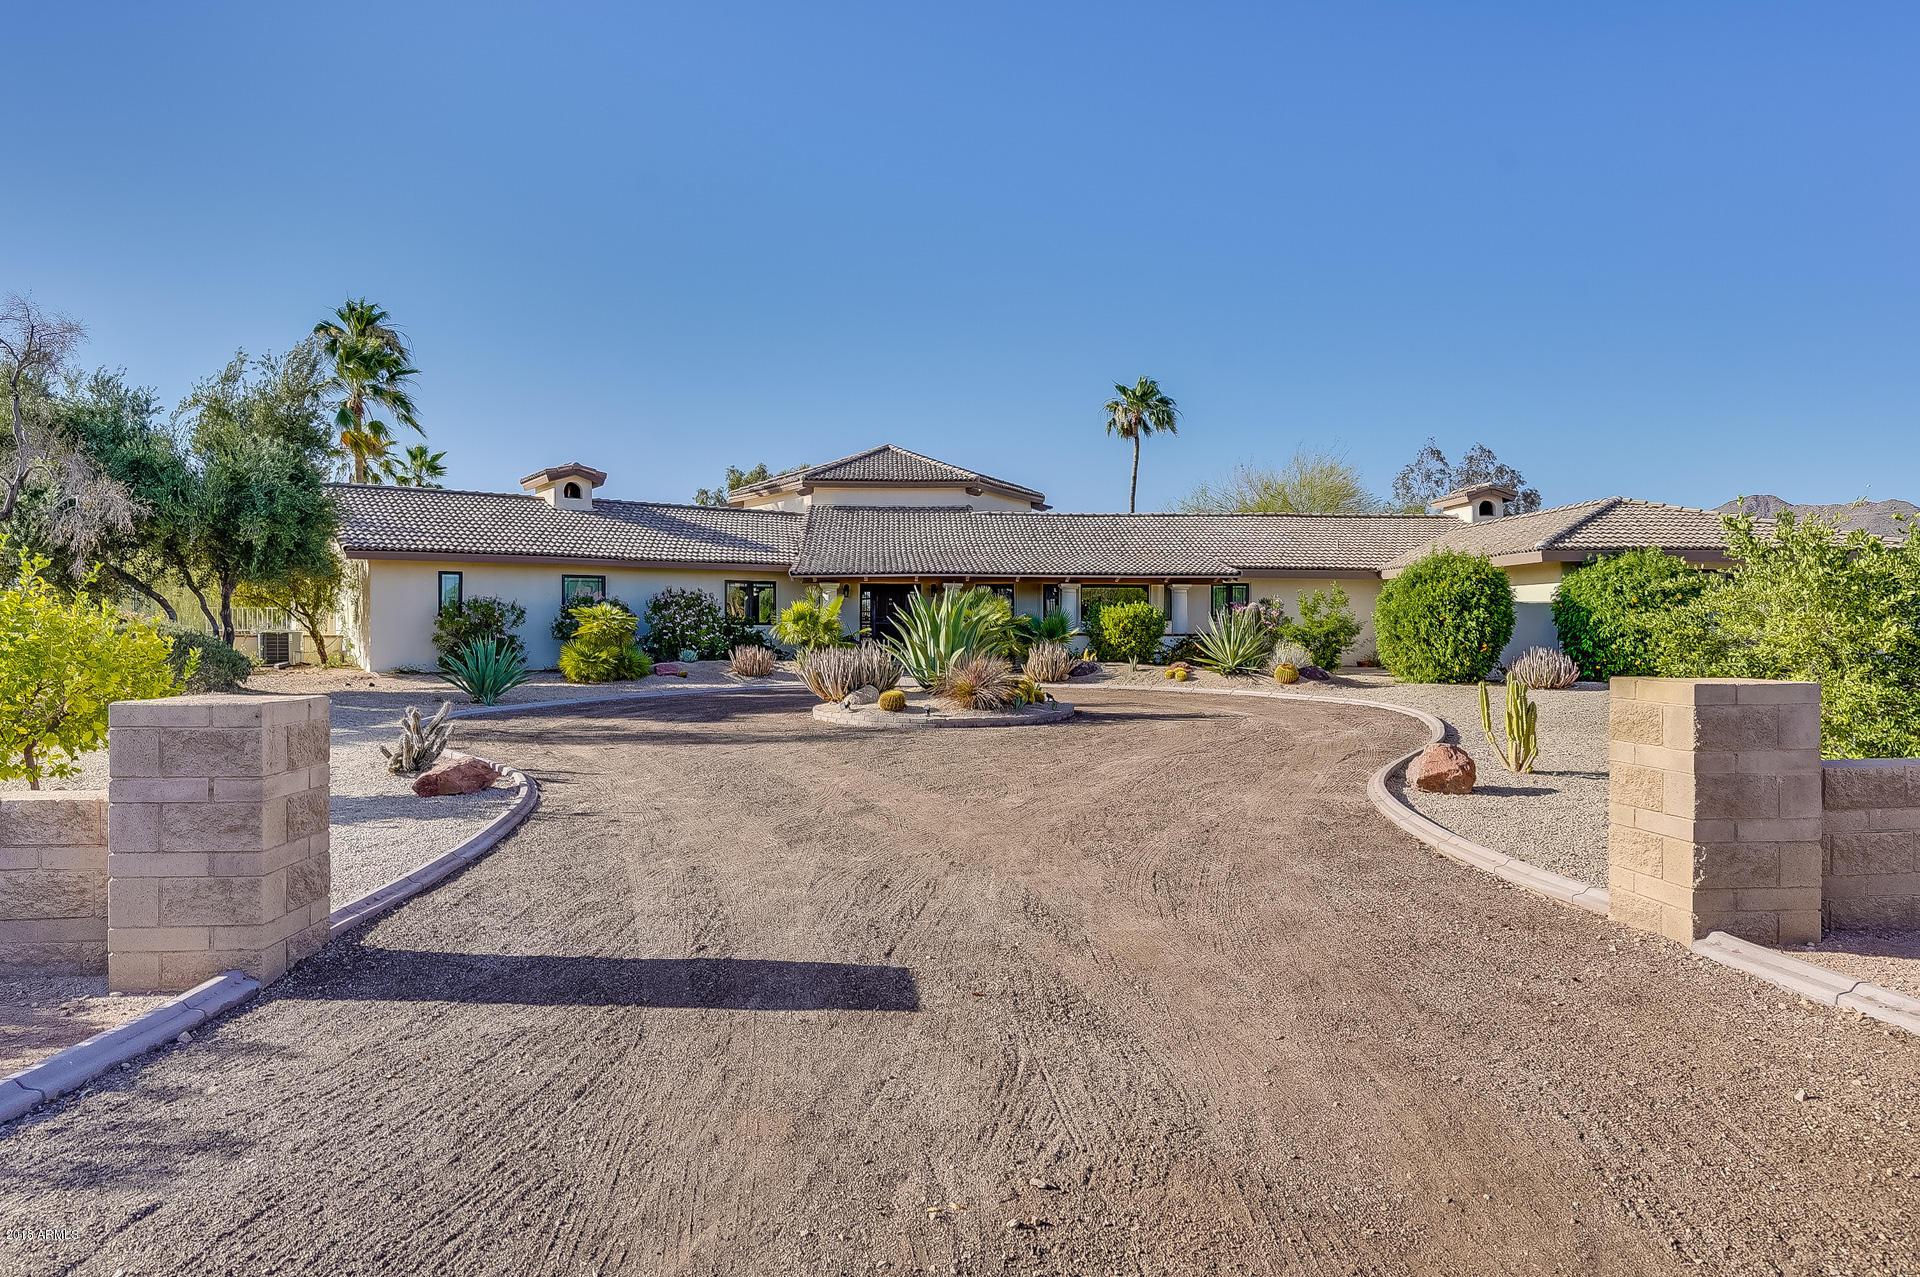 12340 E MOUNTAIN VIEW Road, Scottsdale, AZ 85259